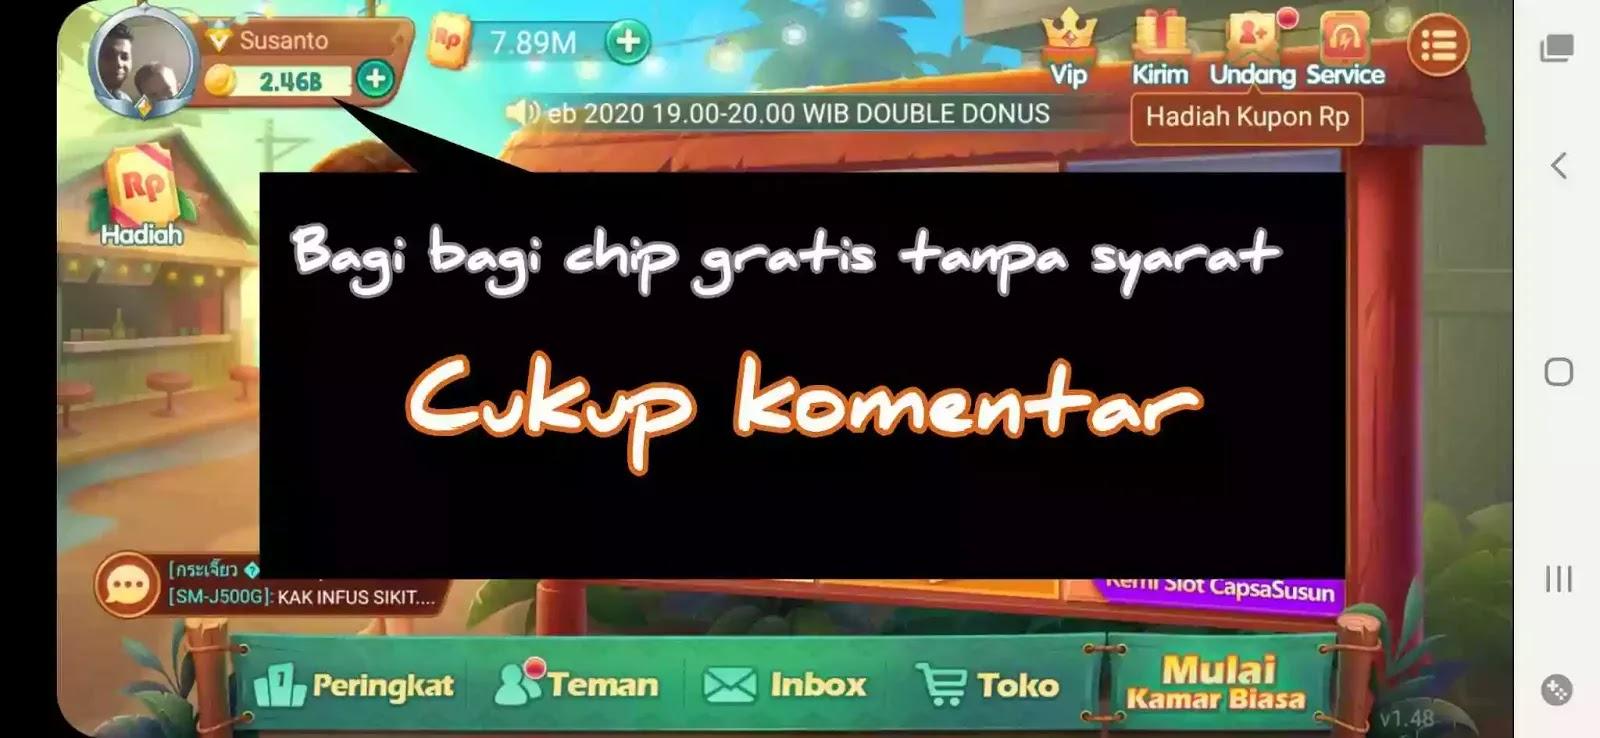 trik nuyul higss domino island mudah work  Gratis Koin Rp Higss Domino Mod Apk 50M